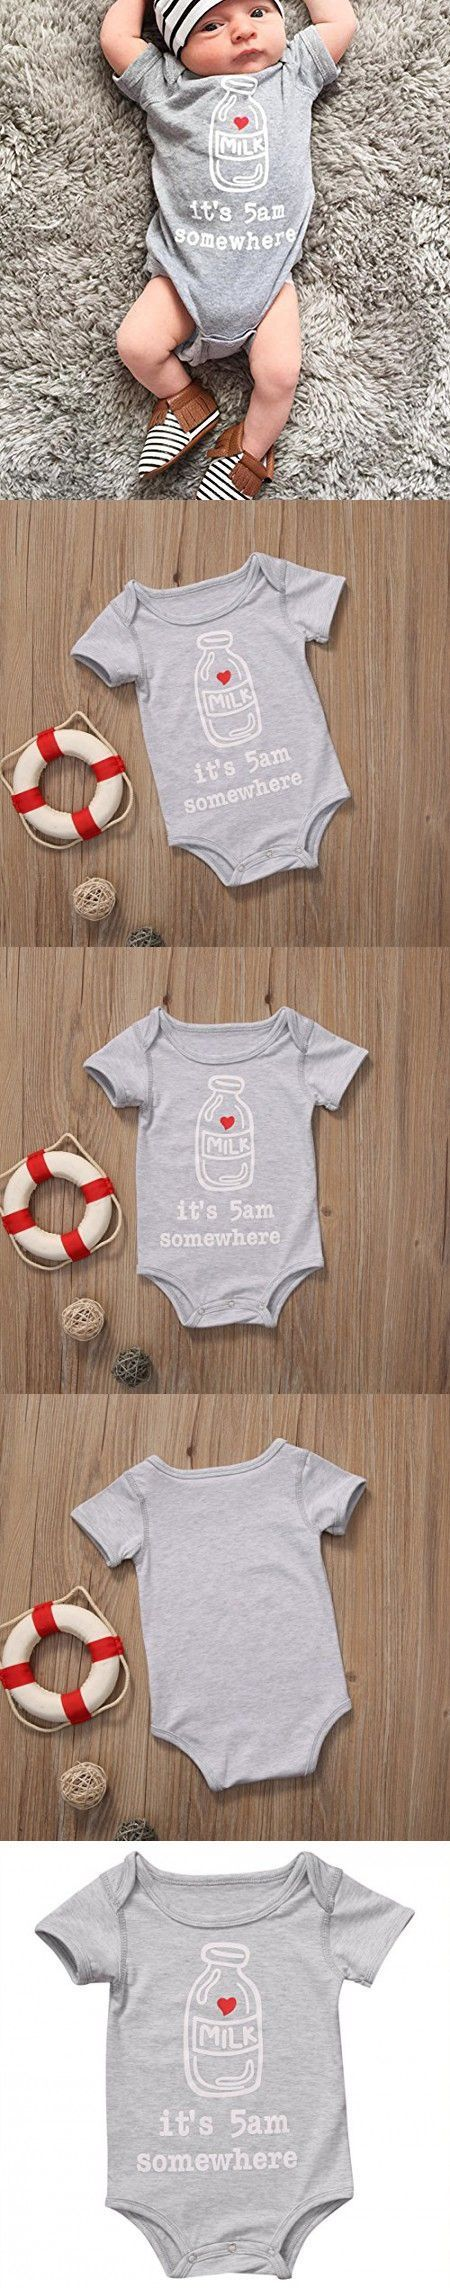 "IT'S 5AM SOMEWHERE ROMPER  Newborn Infant Kids Baby Boy Girl ""It's 5 AM Somewhere"" Romper Clothes Outfits (0-24M)  https://presentbaby.com"